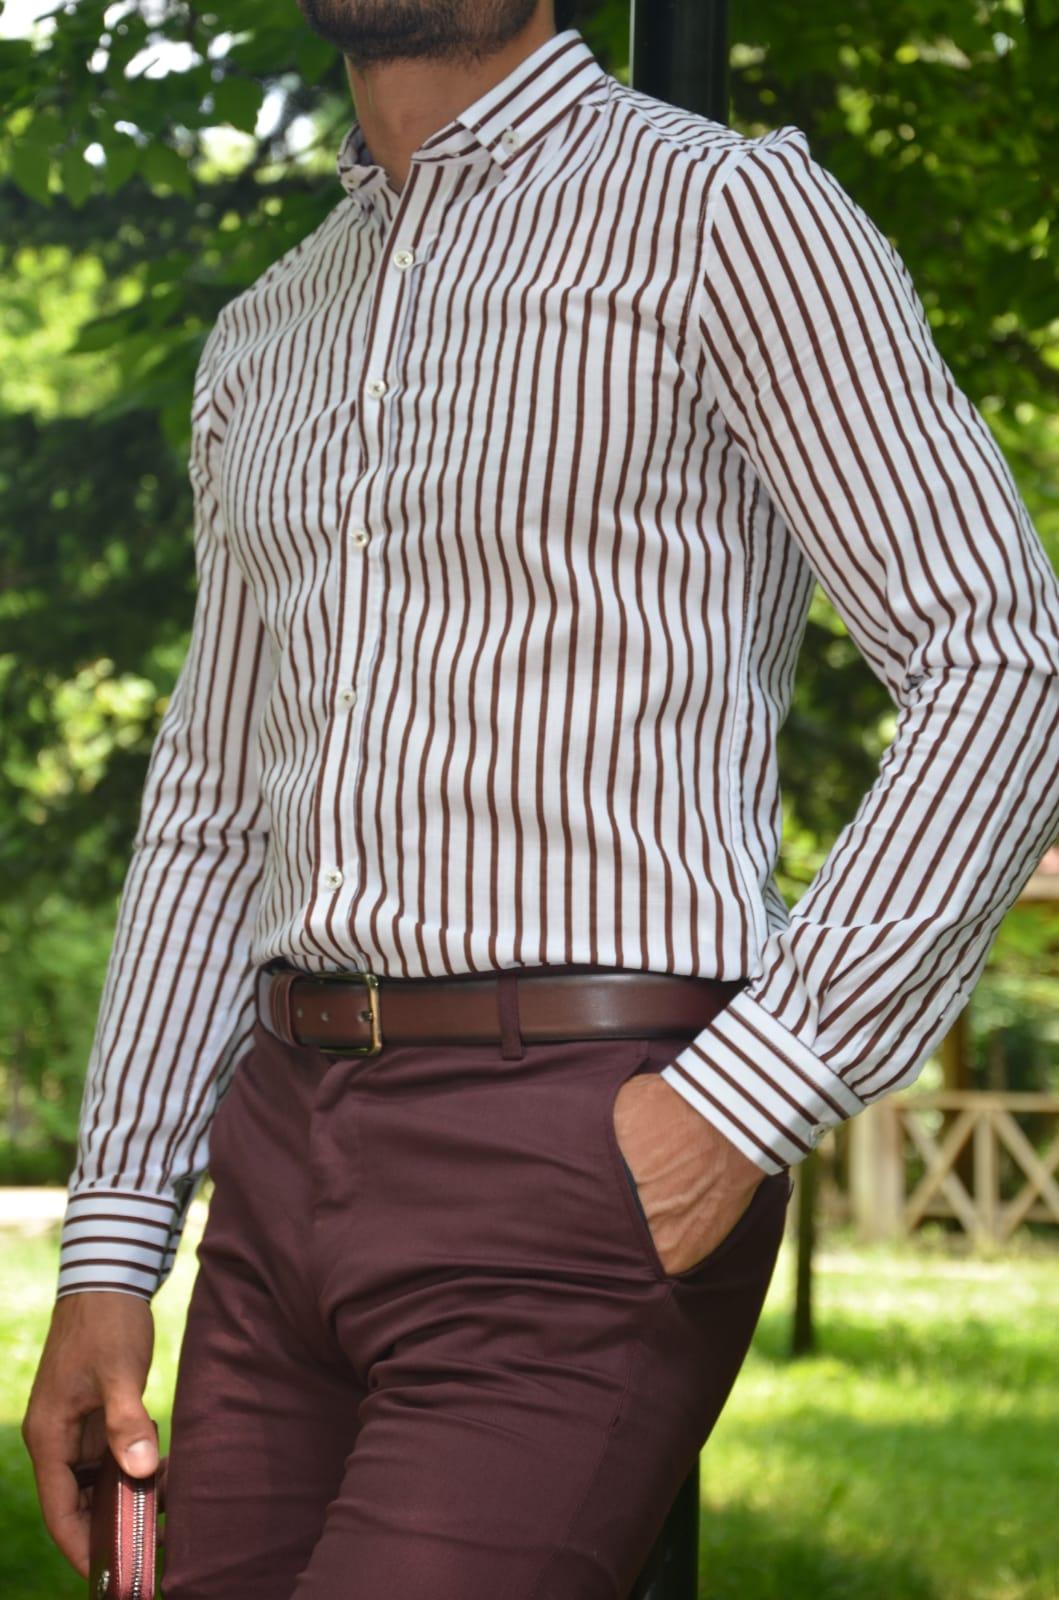 Aysoti Madison Brown Slim Fit Striped Cotton Shirt